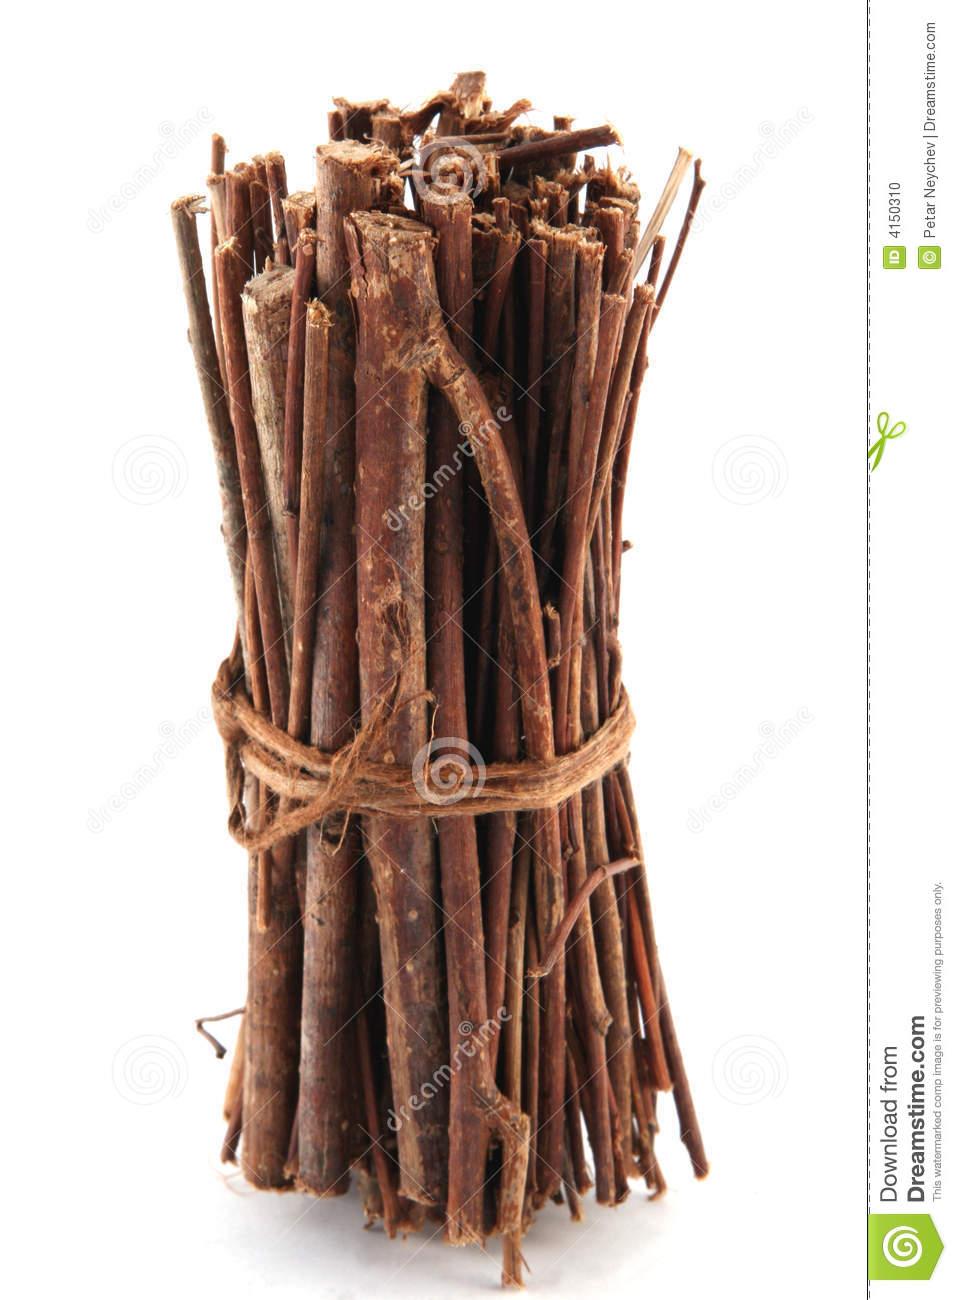 Bundled Firewood Clipart.